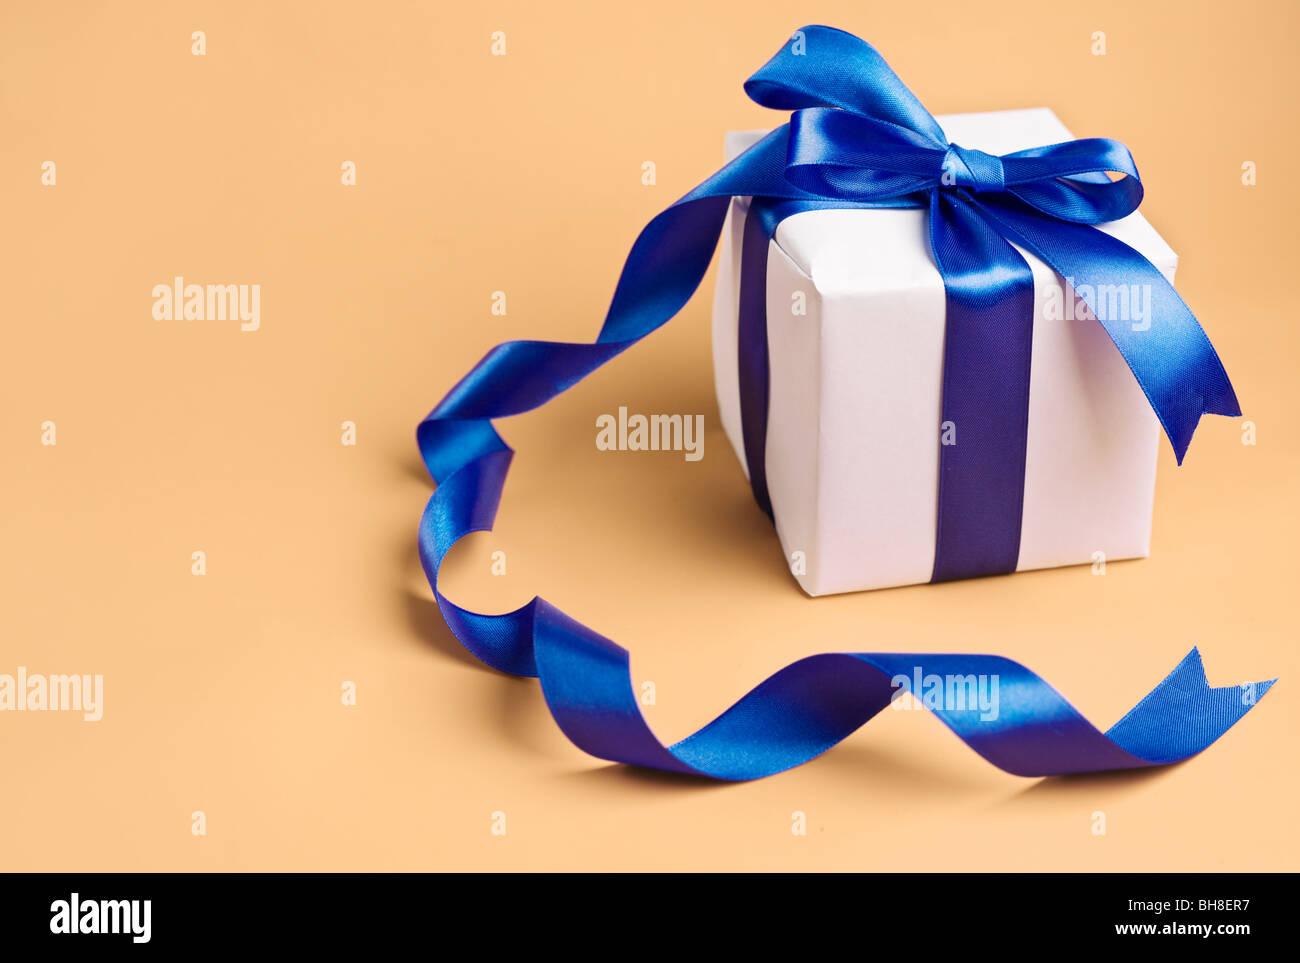 Cadeau blanc avec un ruban bleu sur fond beige Photo Stock